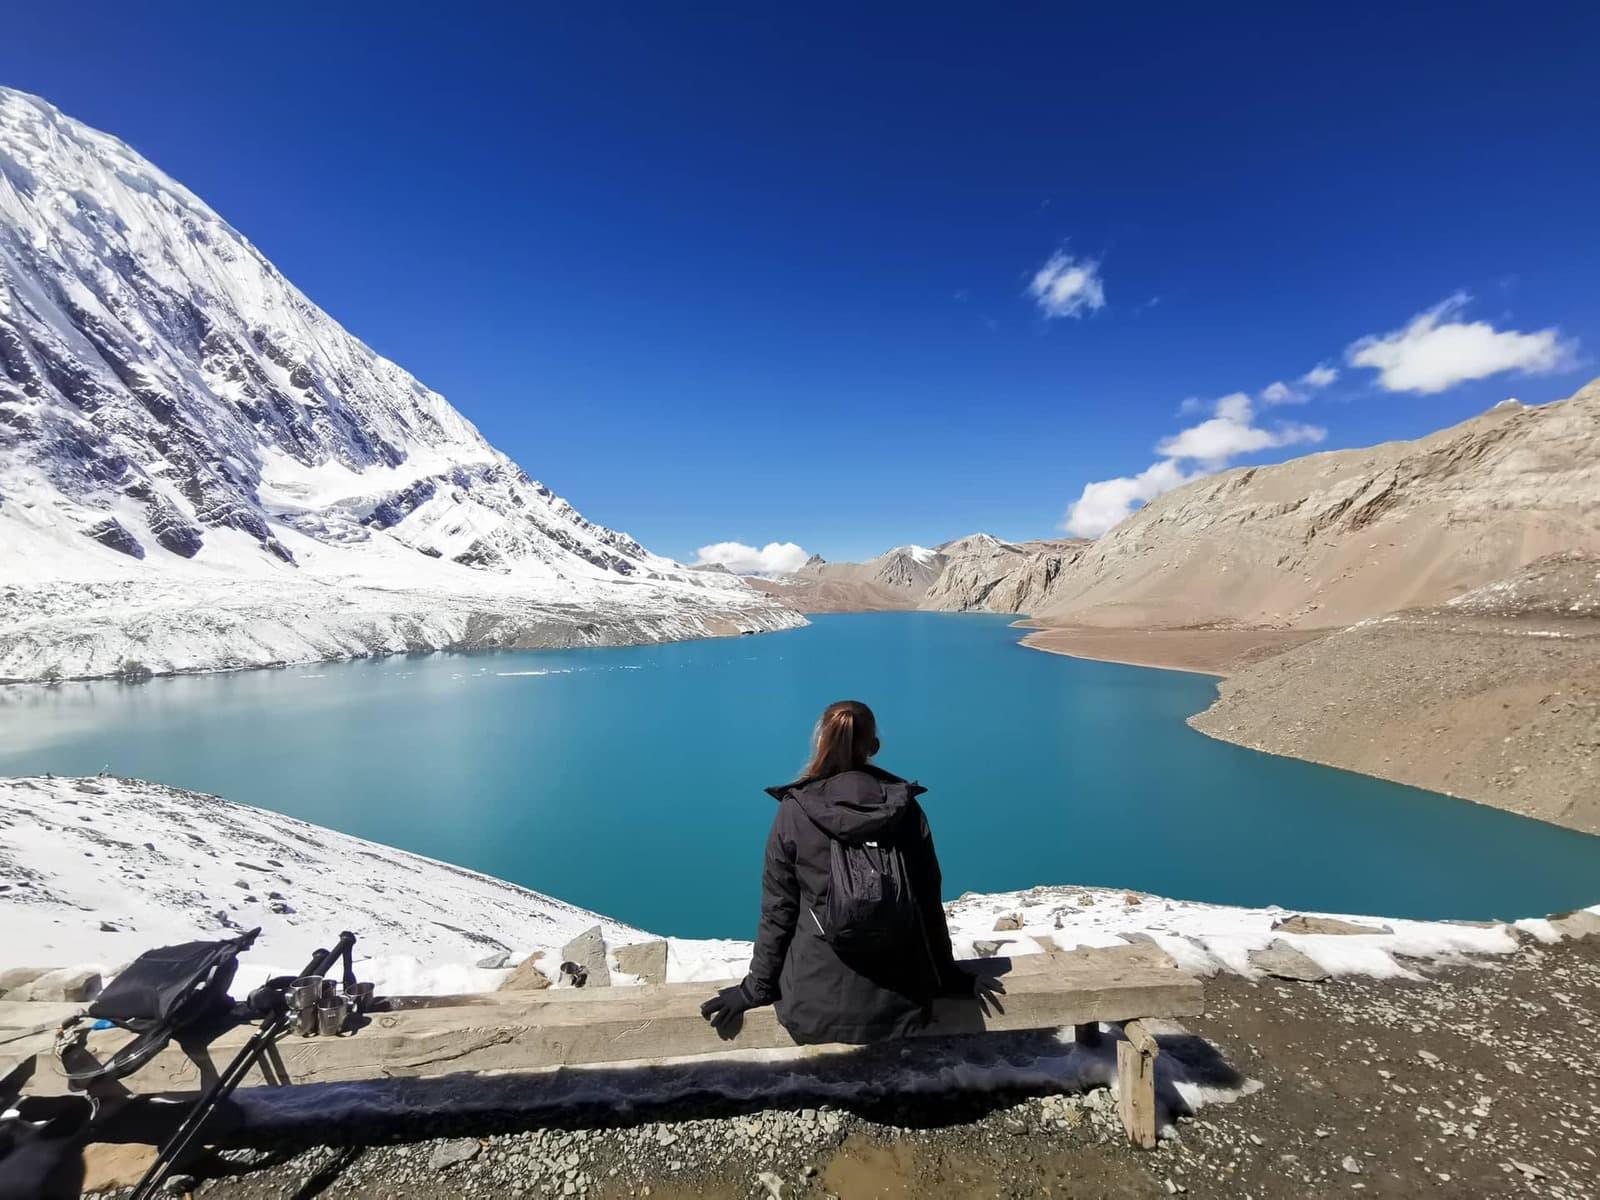 Ciekawostki o Annapurna Circuit - Tilicho Lake